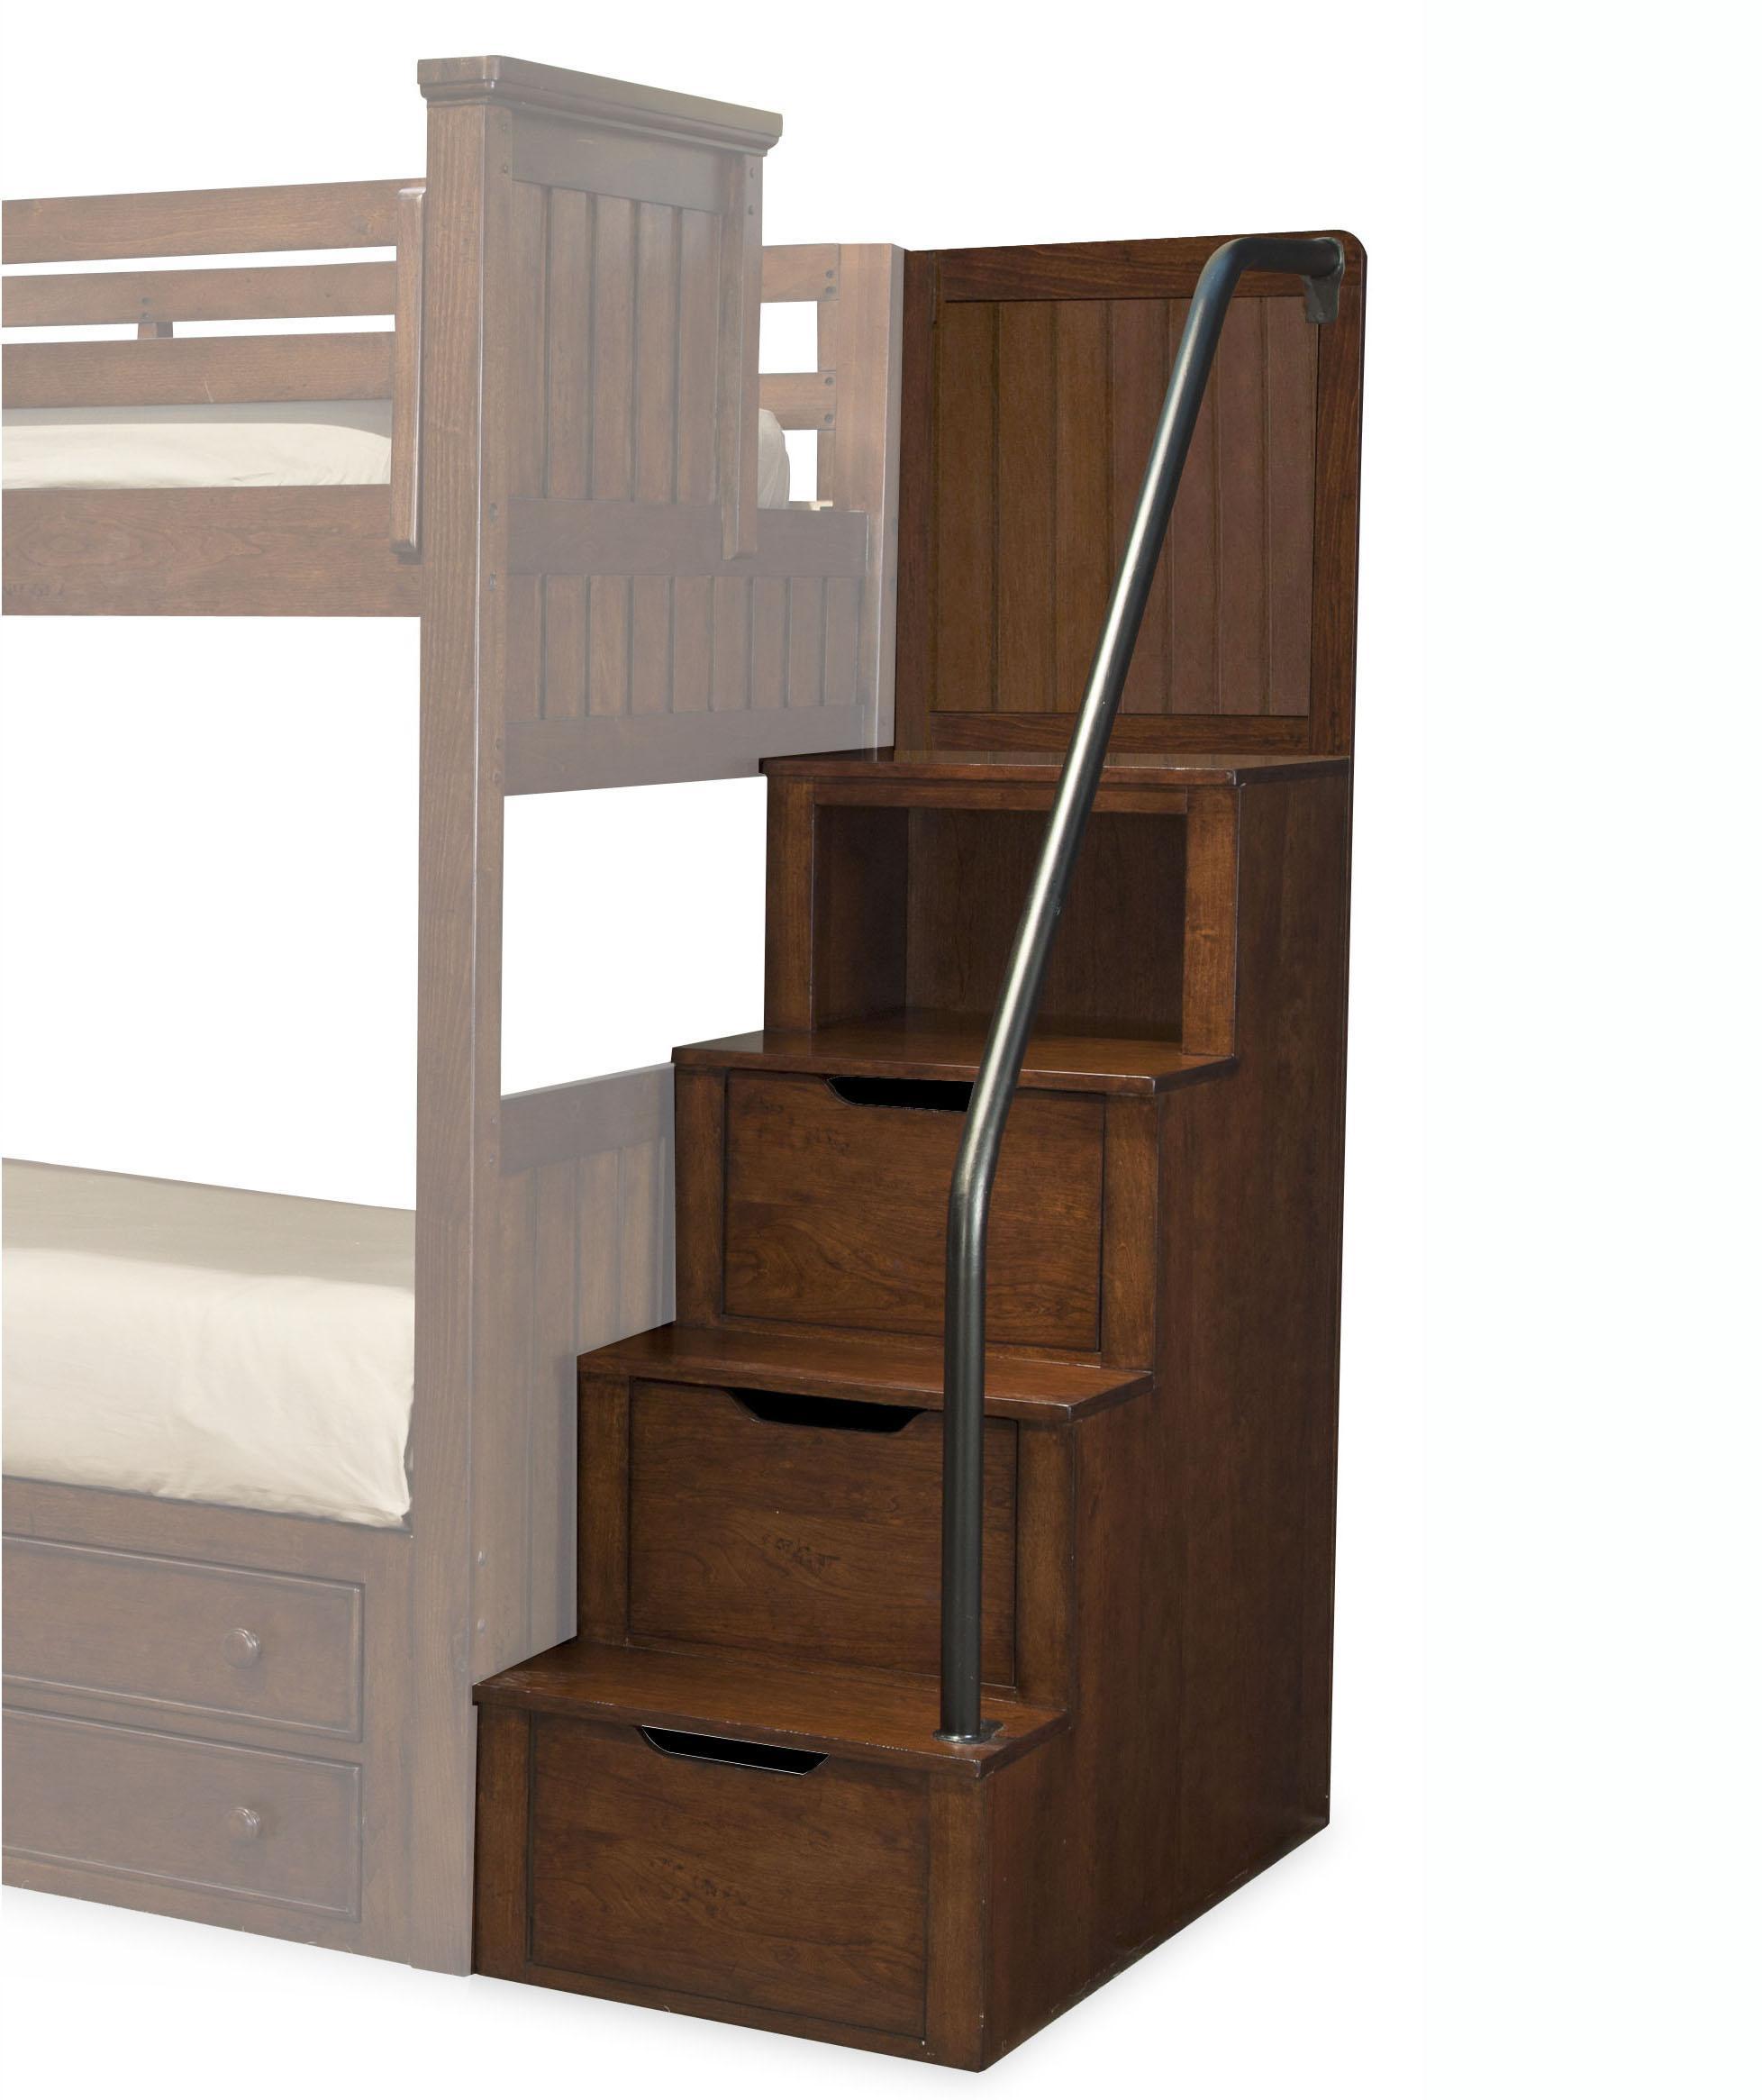 Dawson's Ridge Bunk Loft Steps by Legacy Classic Kids at HomeWorld Furniture